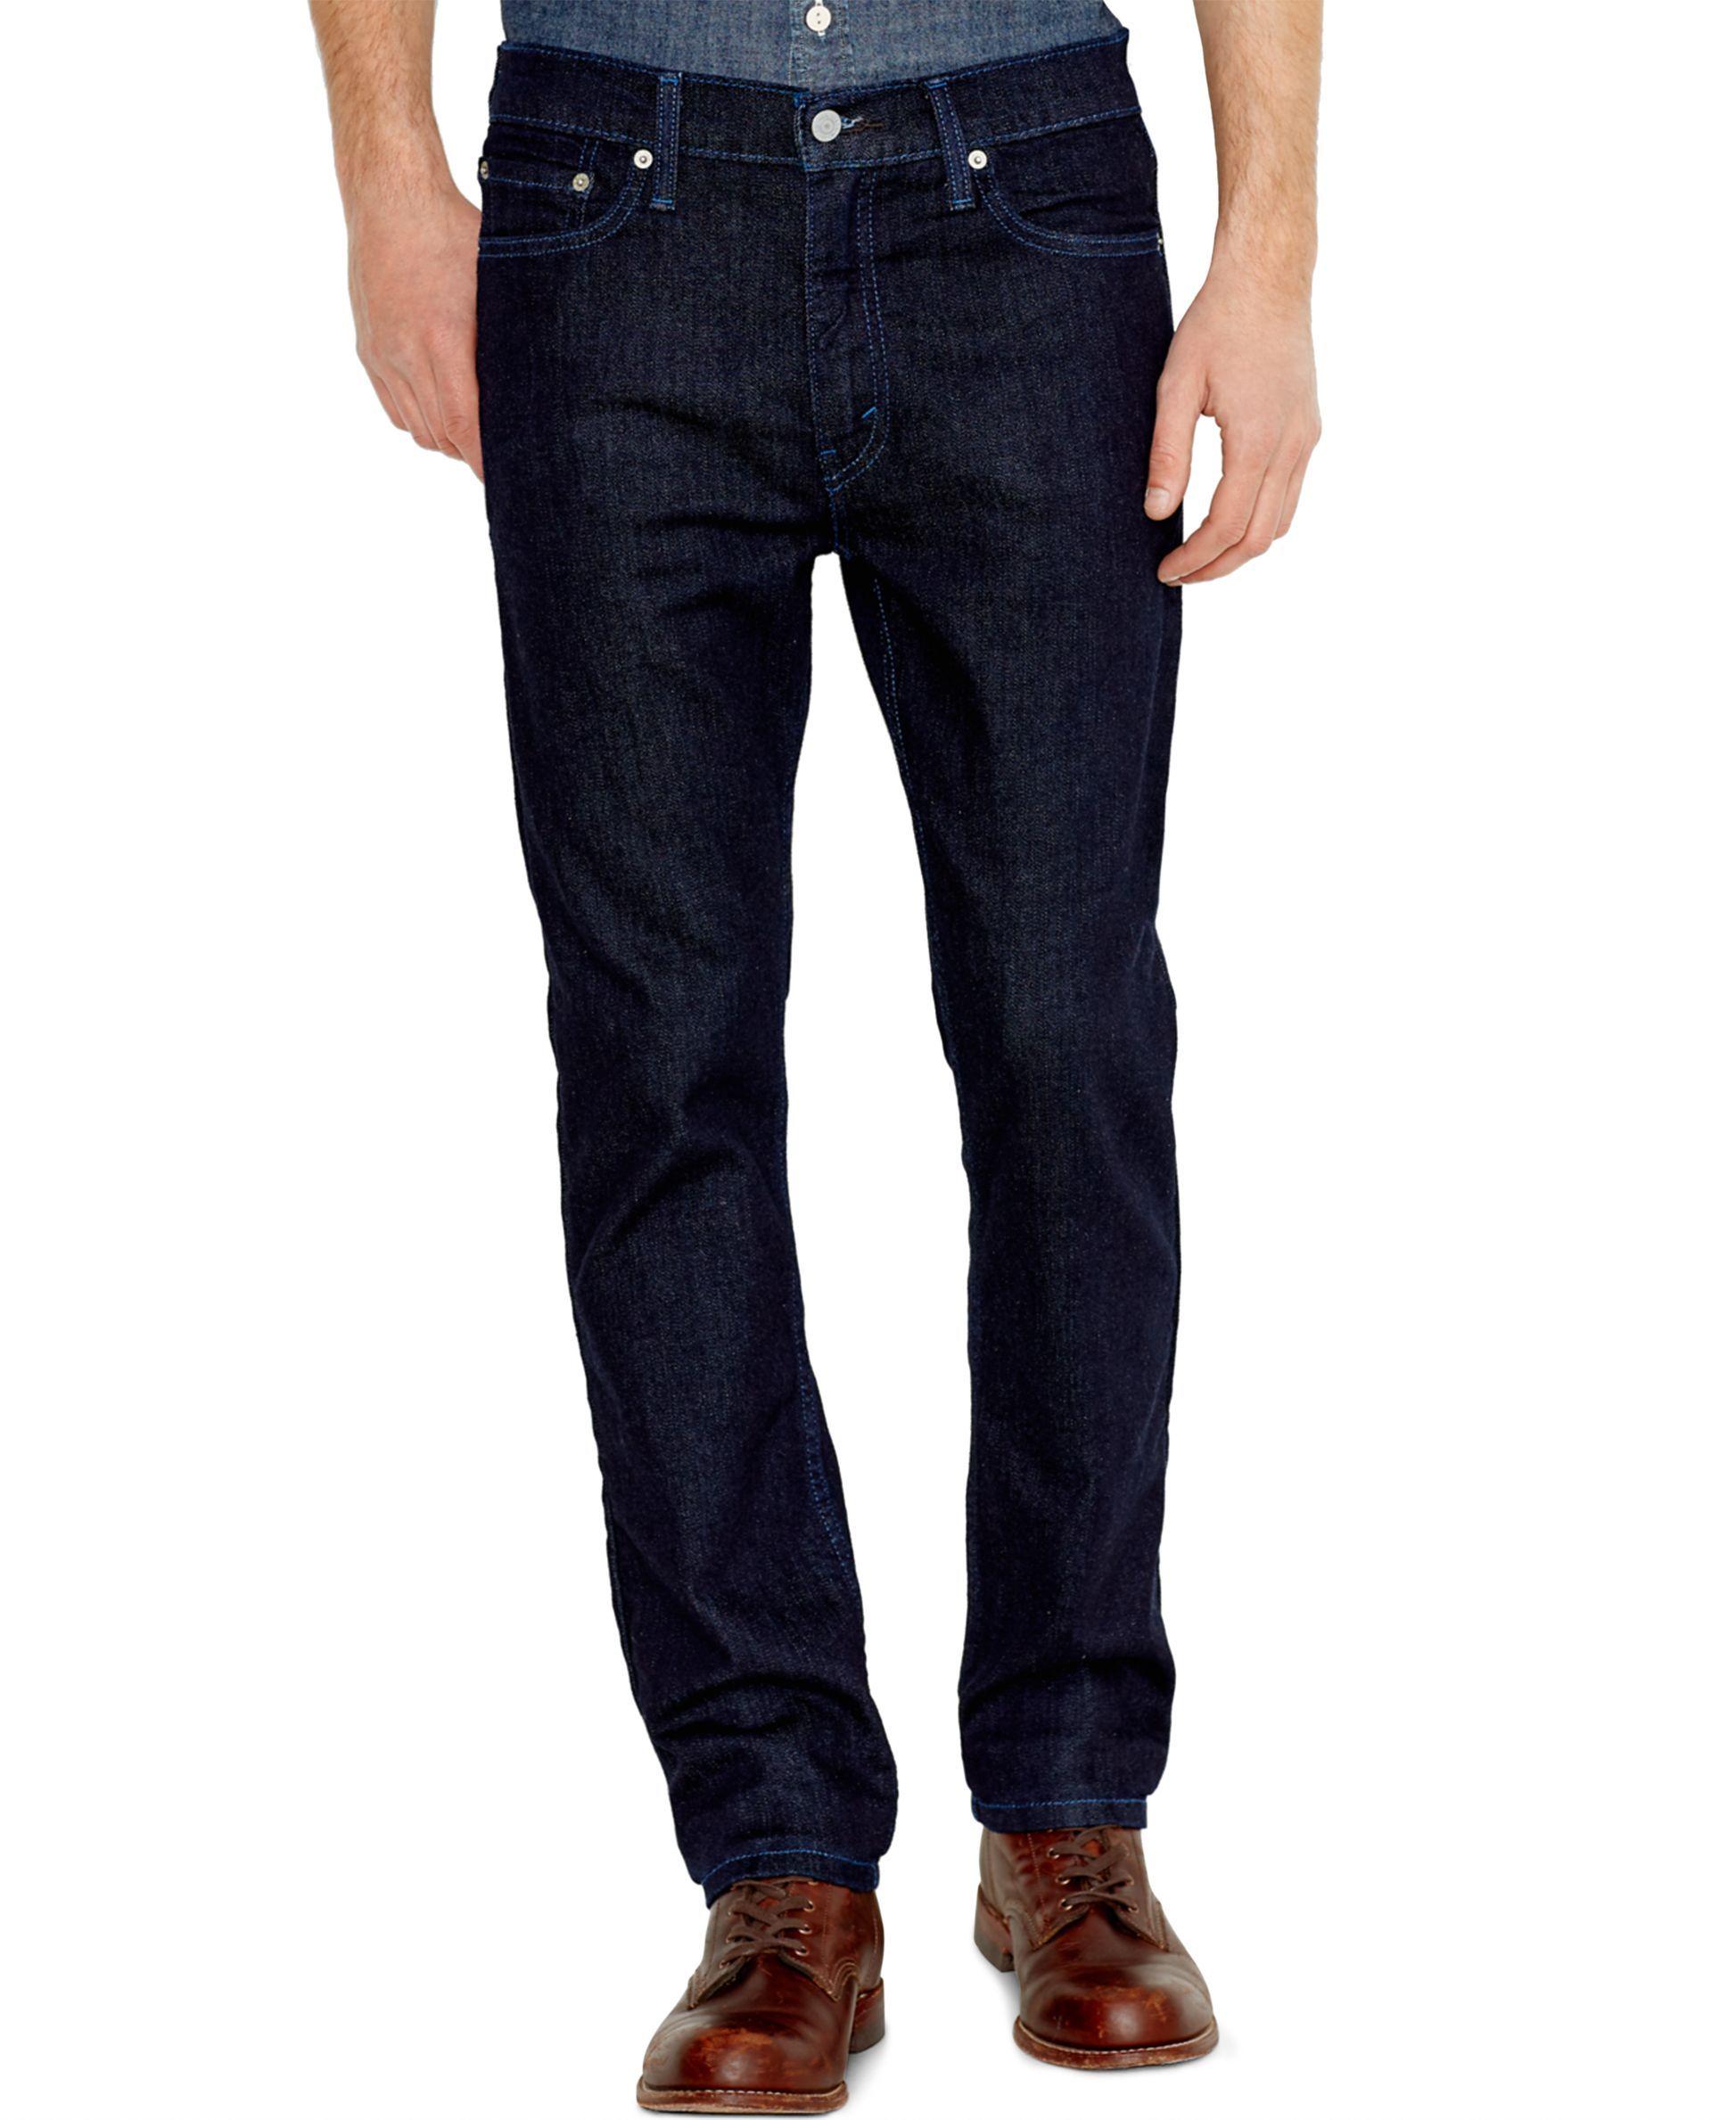 aa1753b160 Levi s 513 Midnight Wash Slim Straight Motion Jeans